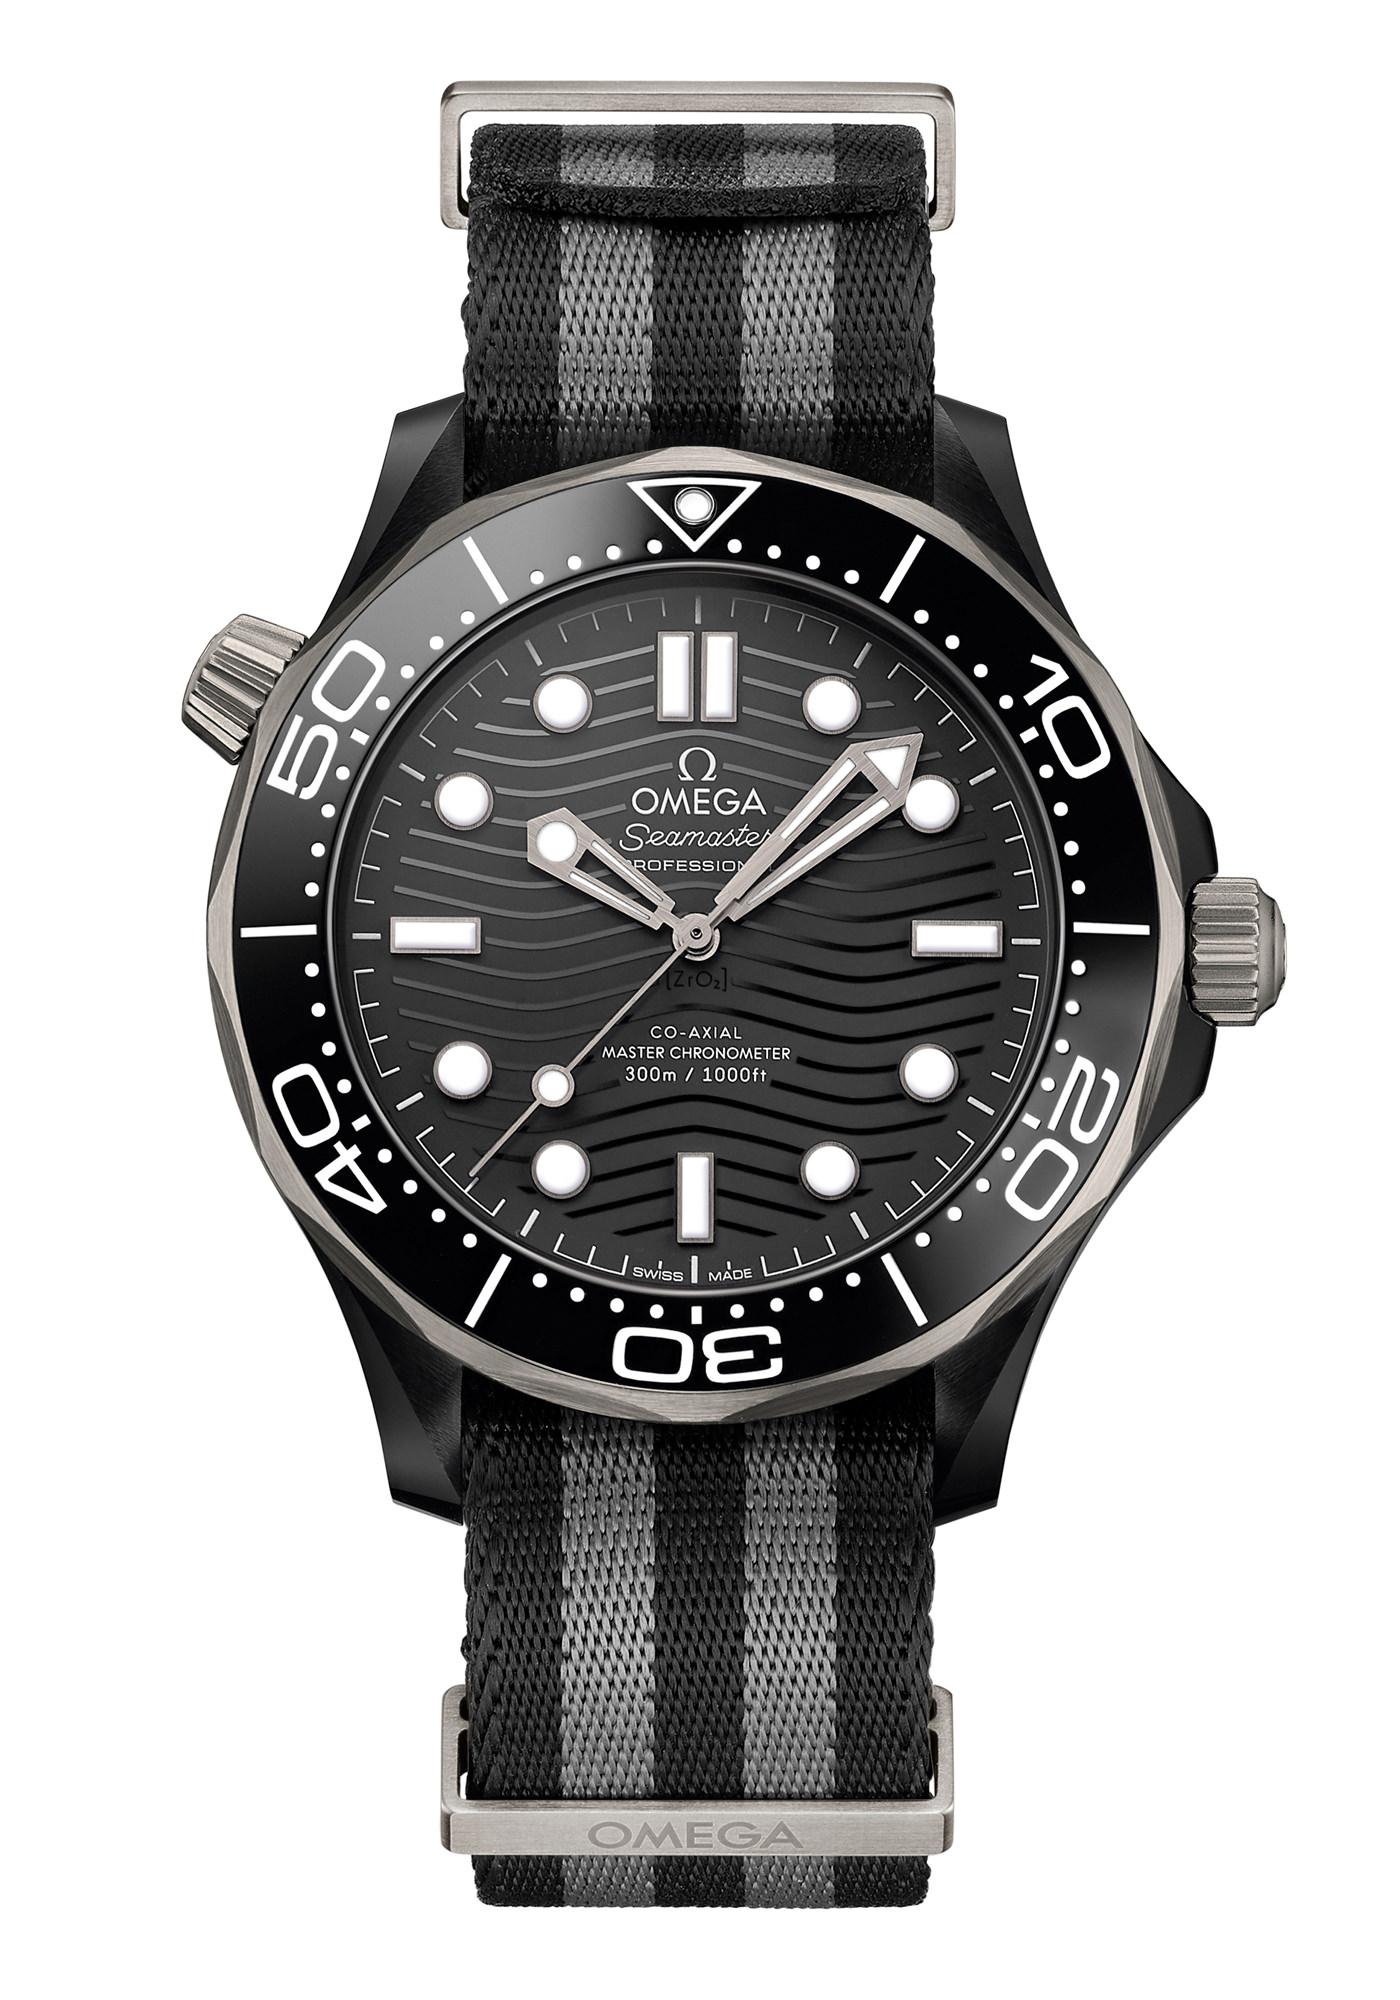 Montre Omega Seamaster Diver 300M Céramique Titanium Bracelet NATO Gris Rayures